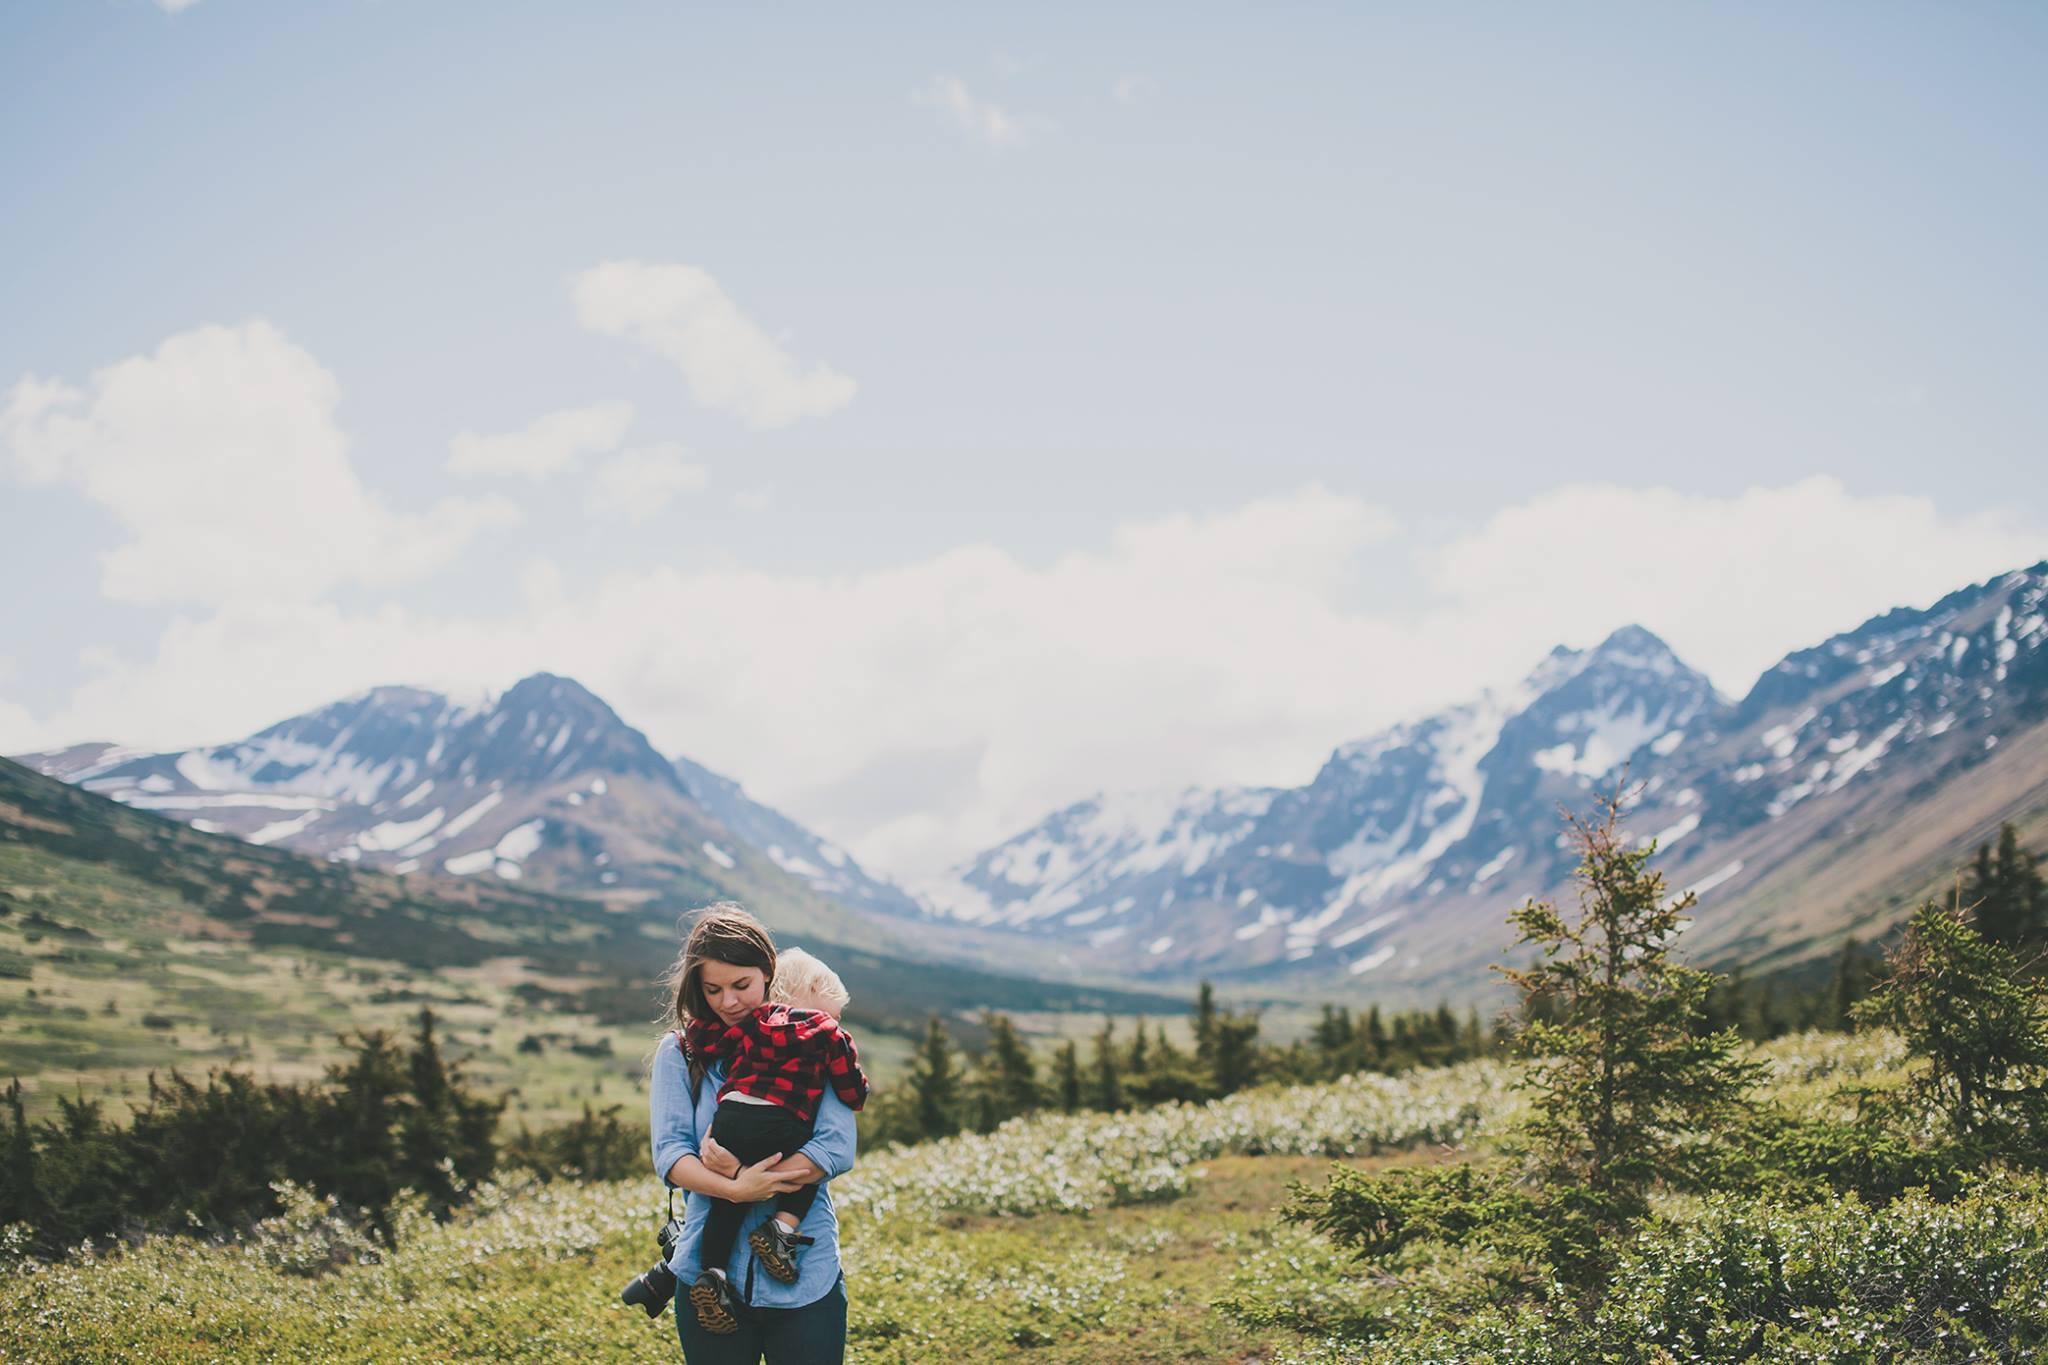 Photography by Grace Adams of Jess Hunter in Alaska